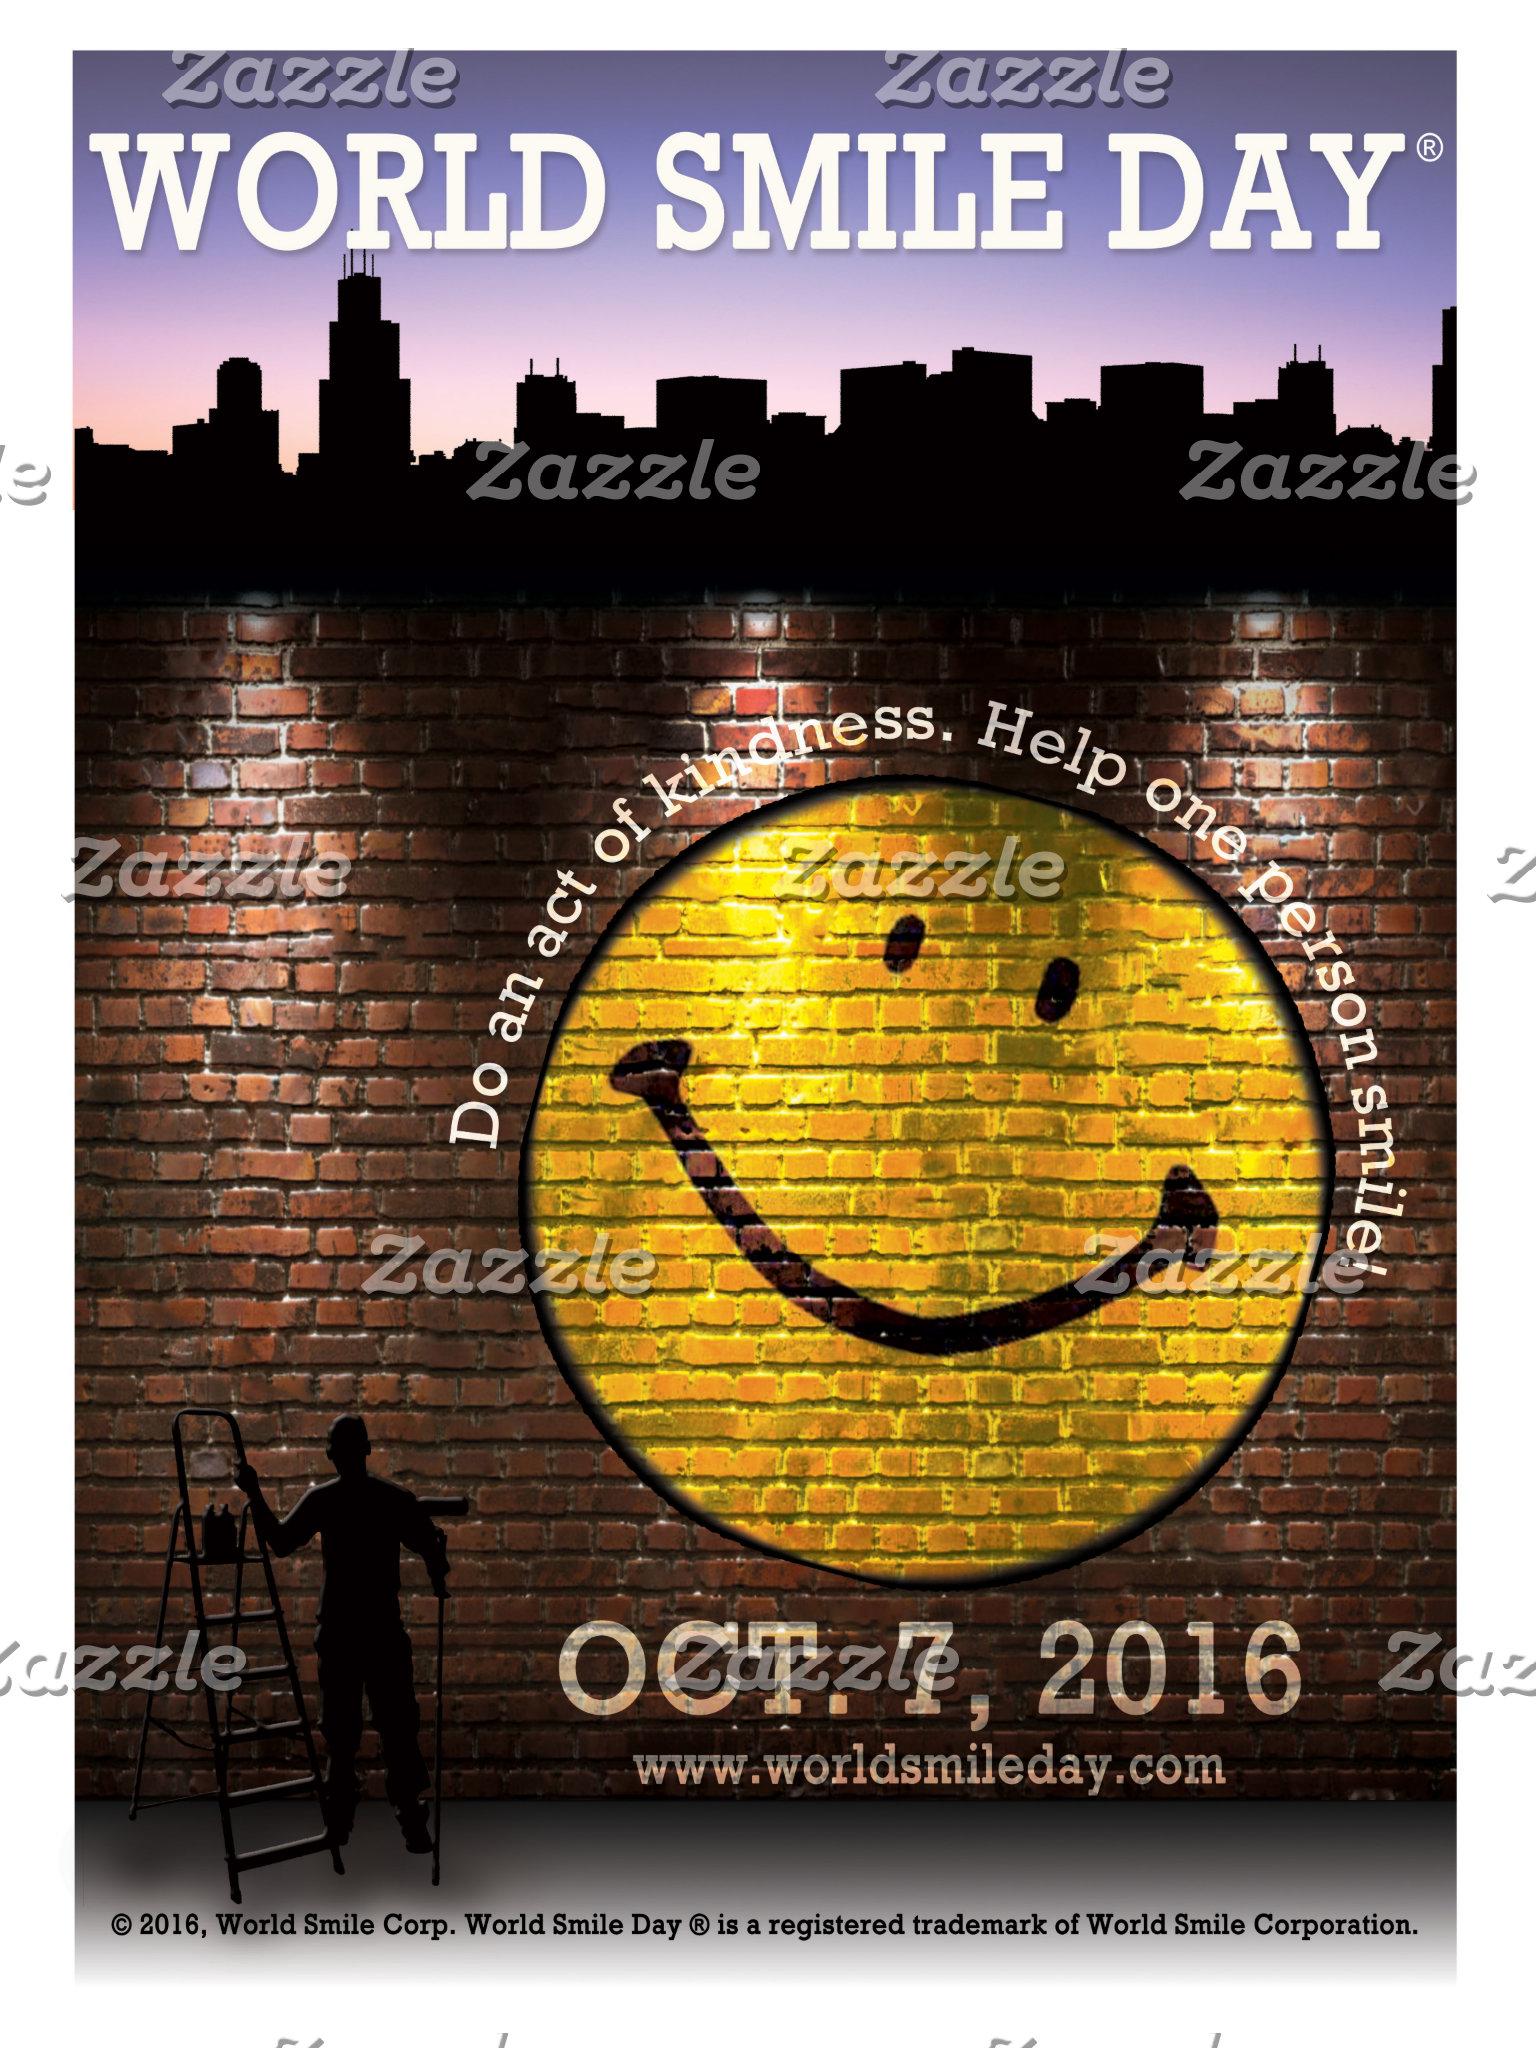 World Smile Day® 2016